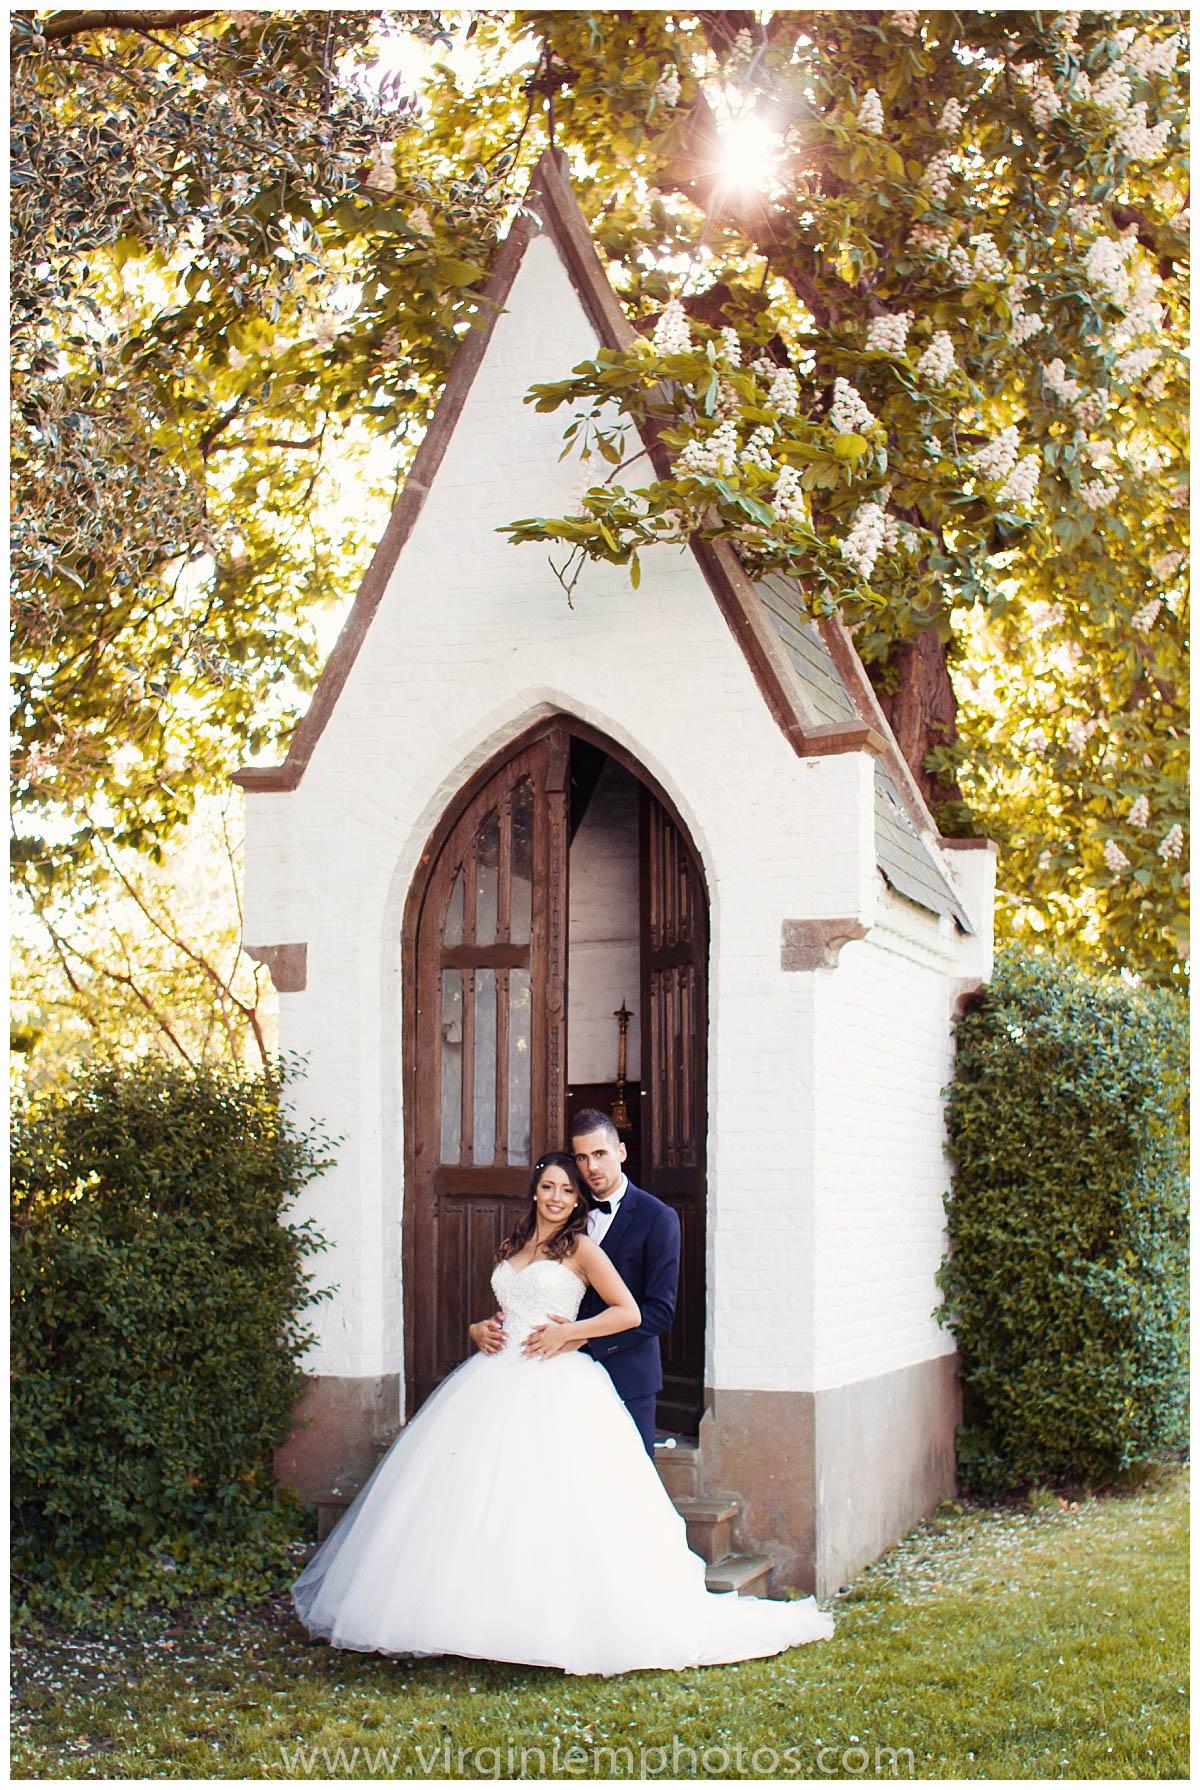 Virginie M. Photos-photographe nord-mariage-couple (15)